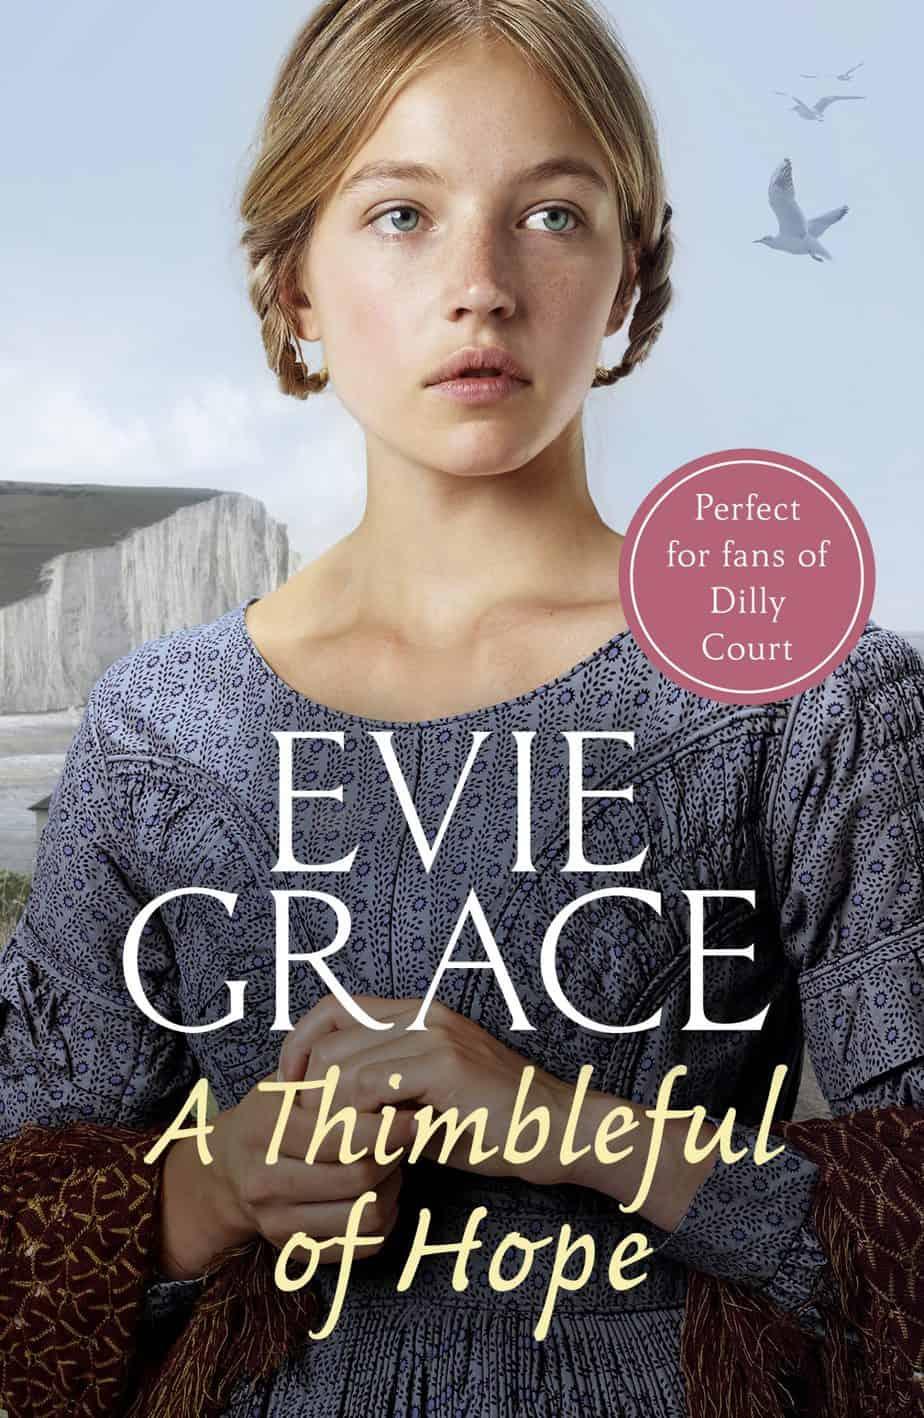 A Thimbleful of Hope Evie Grace